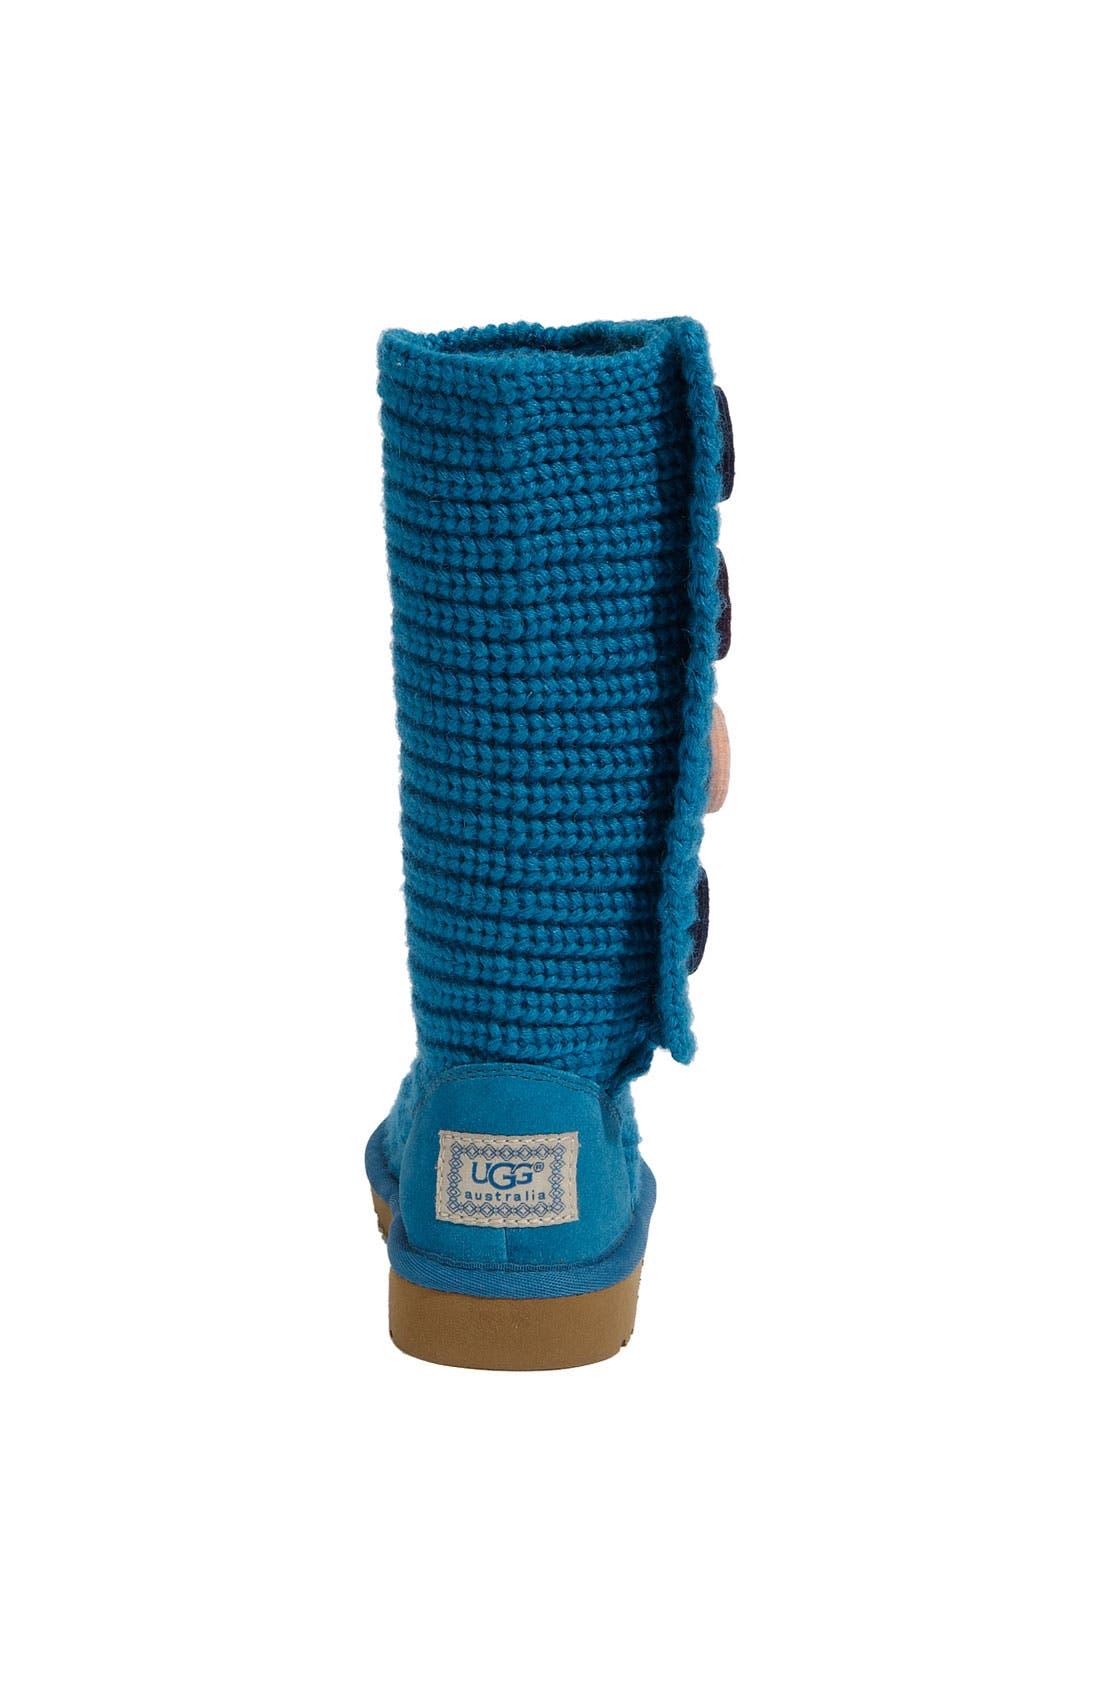 Alternate Image 4  - UGG® Australia 'Cardy II' Crochet Boot (Toddler, Little Kid & Big Kid)